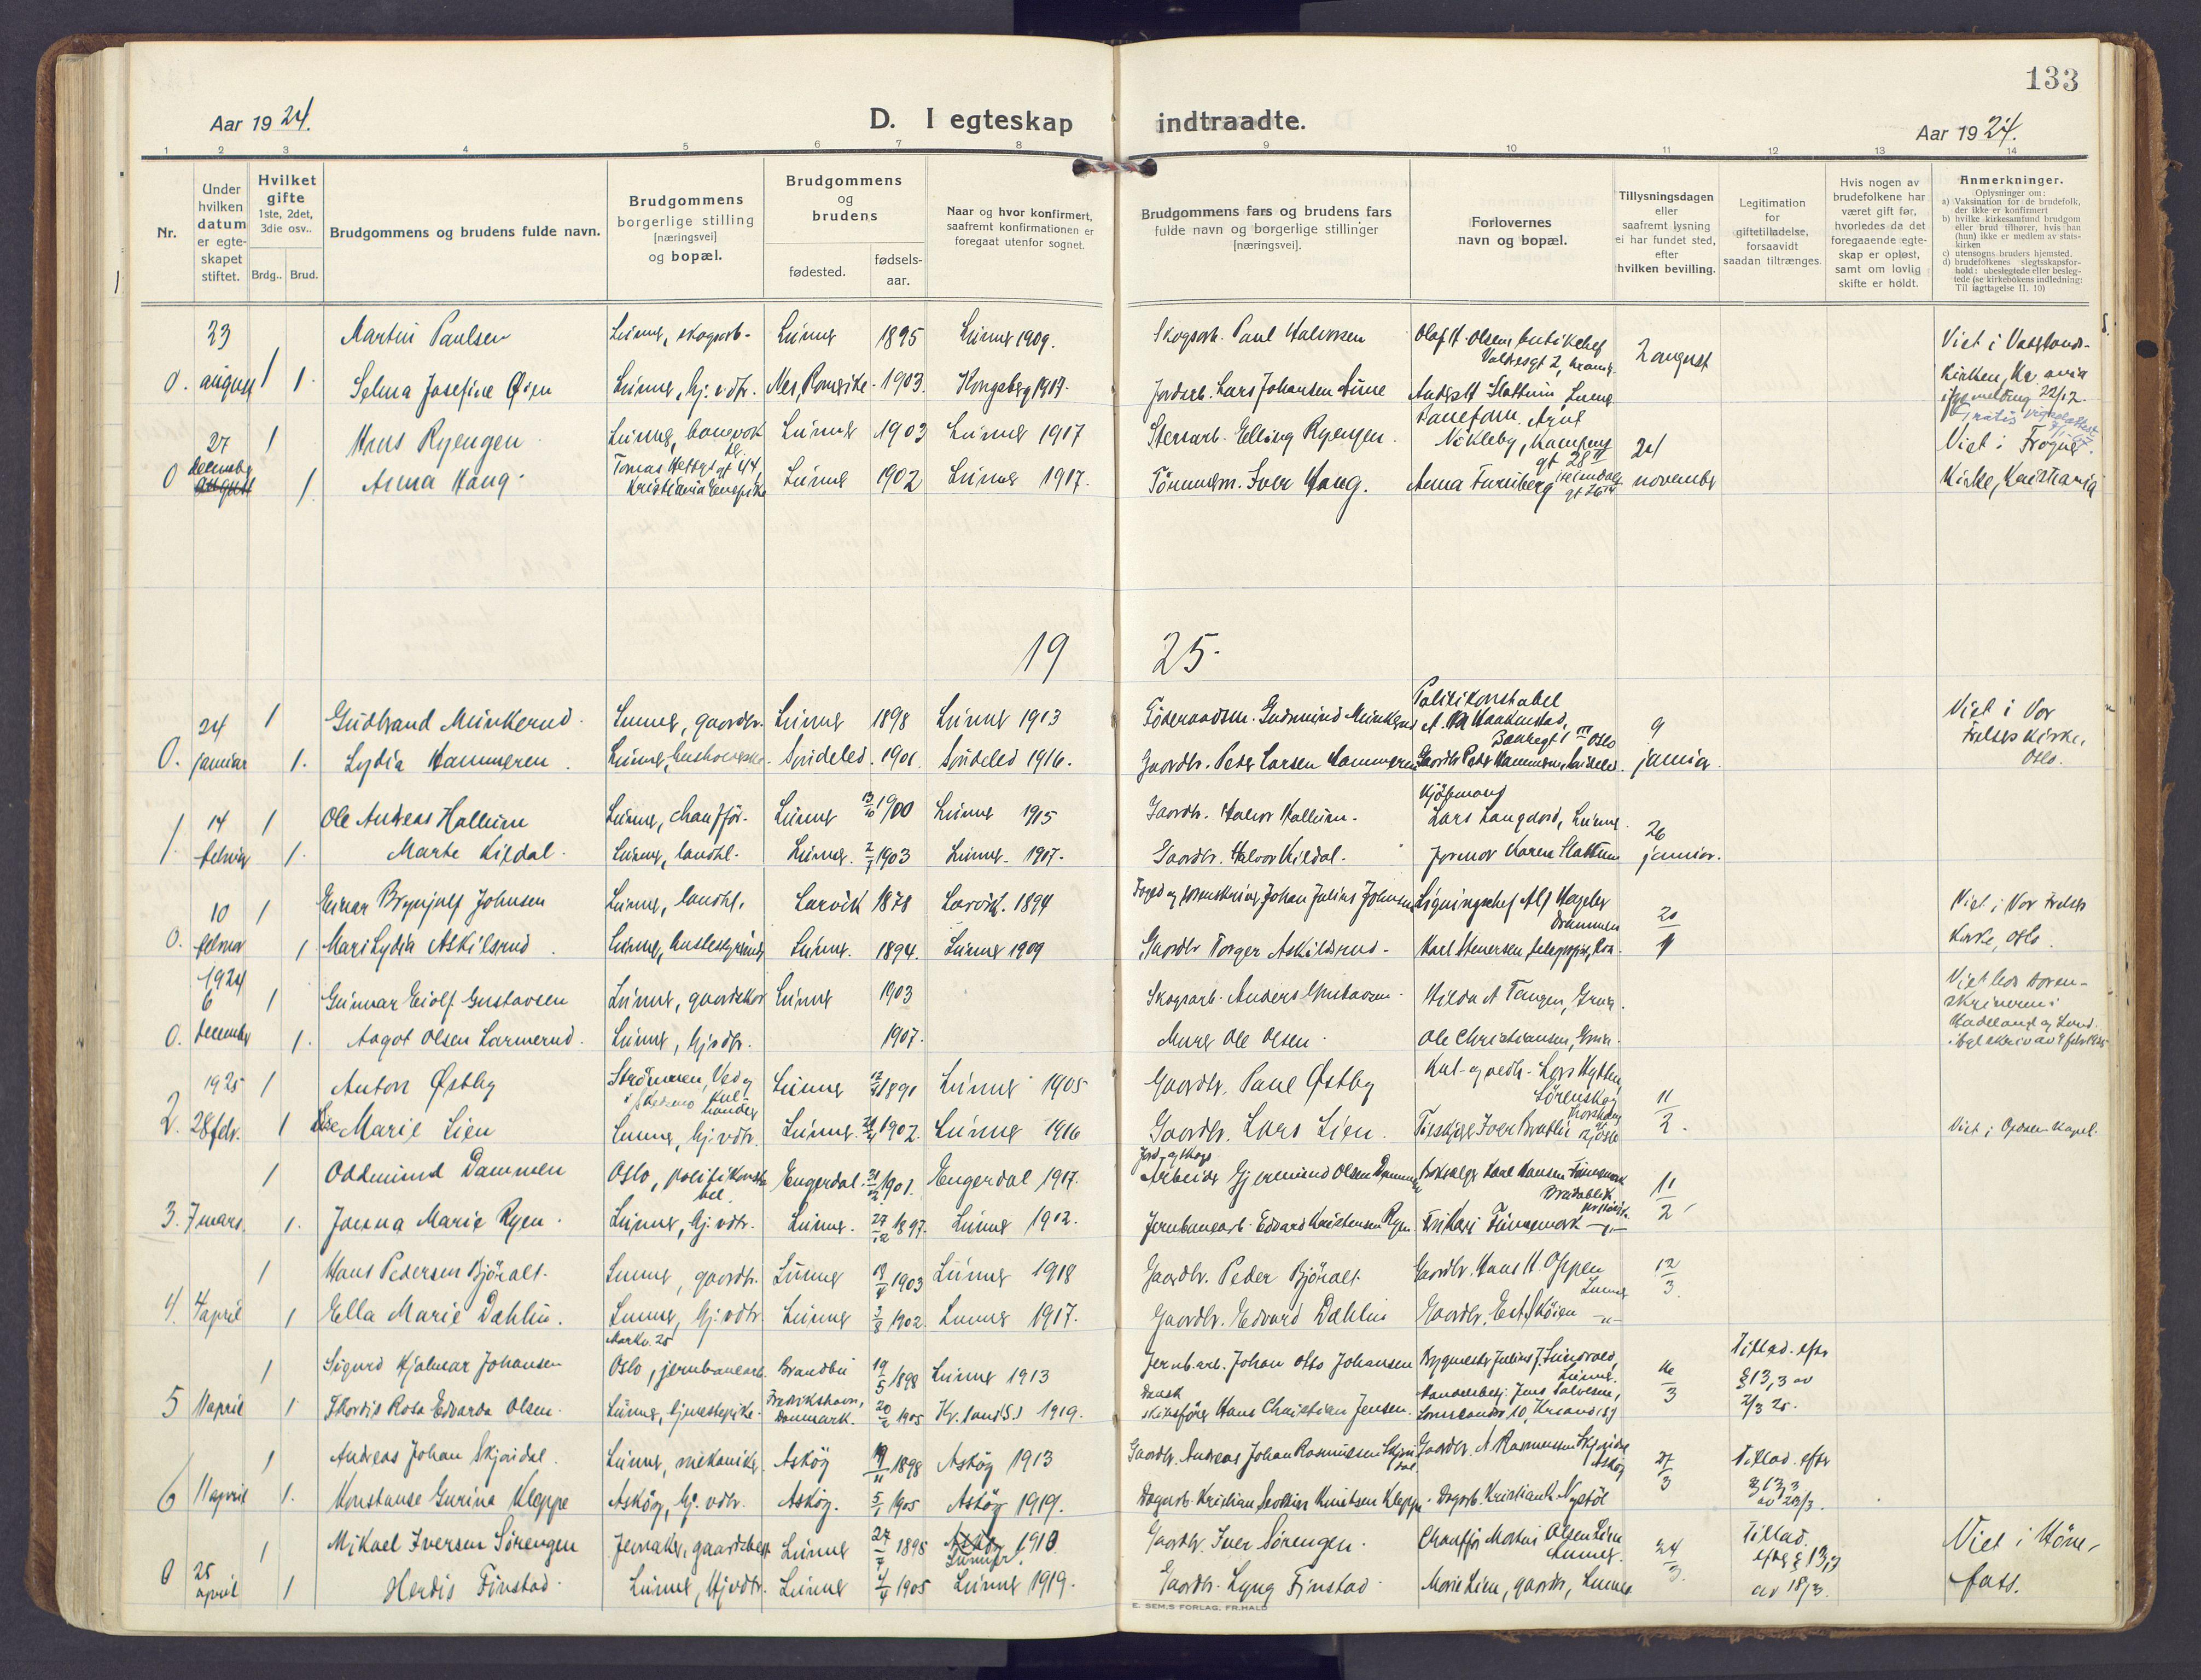 SAH, Lunner prestekontor, H/Ha/Haa/L0002: Ministerialbok nr. 2, 1922-1931, s. 133